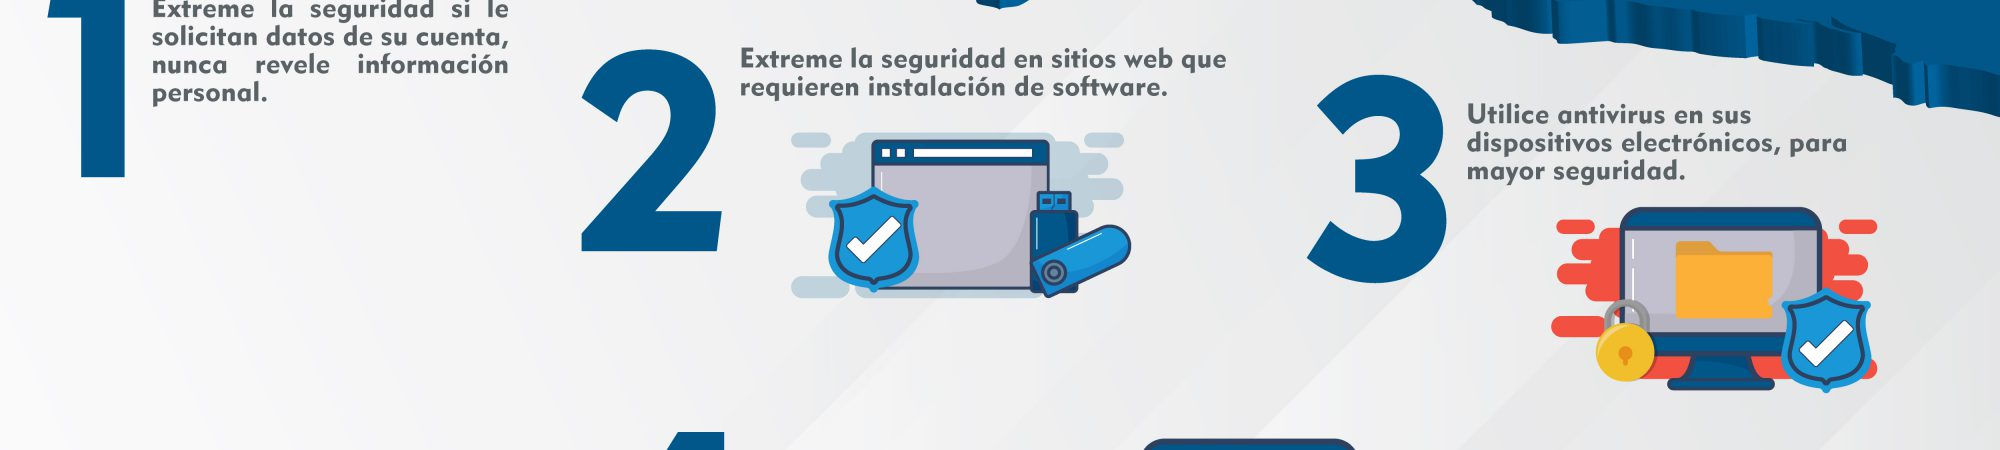 Infografia Seguridad uso de internet en hogares